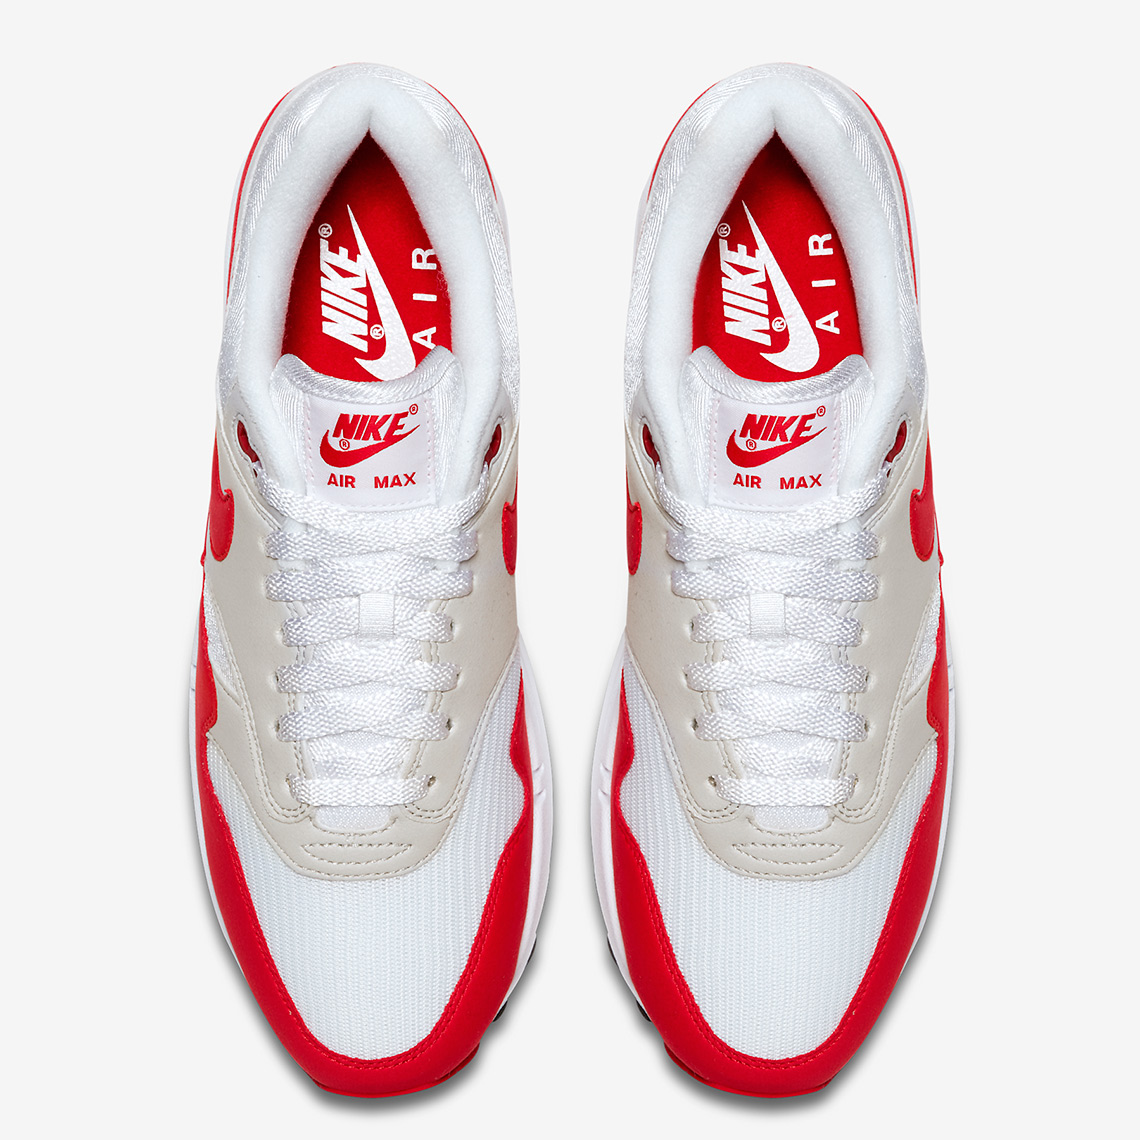 pretty nice f6445 2078e Nike Air Max 1 Anniversary 908375-103 Restock Info   SneakerNews.com